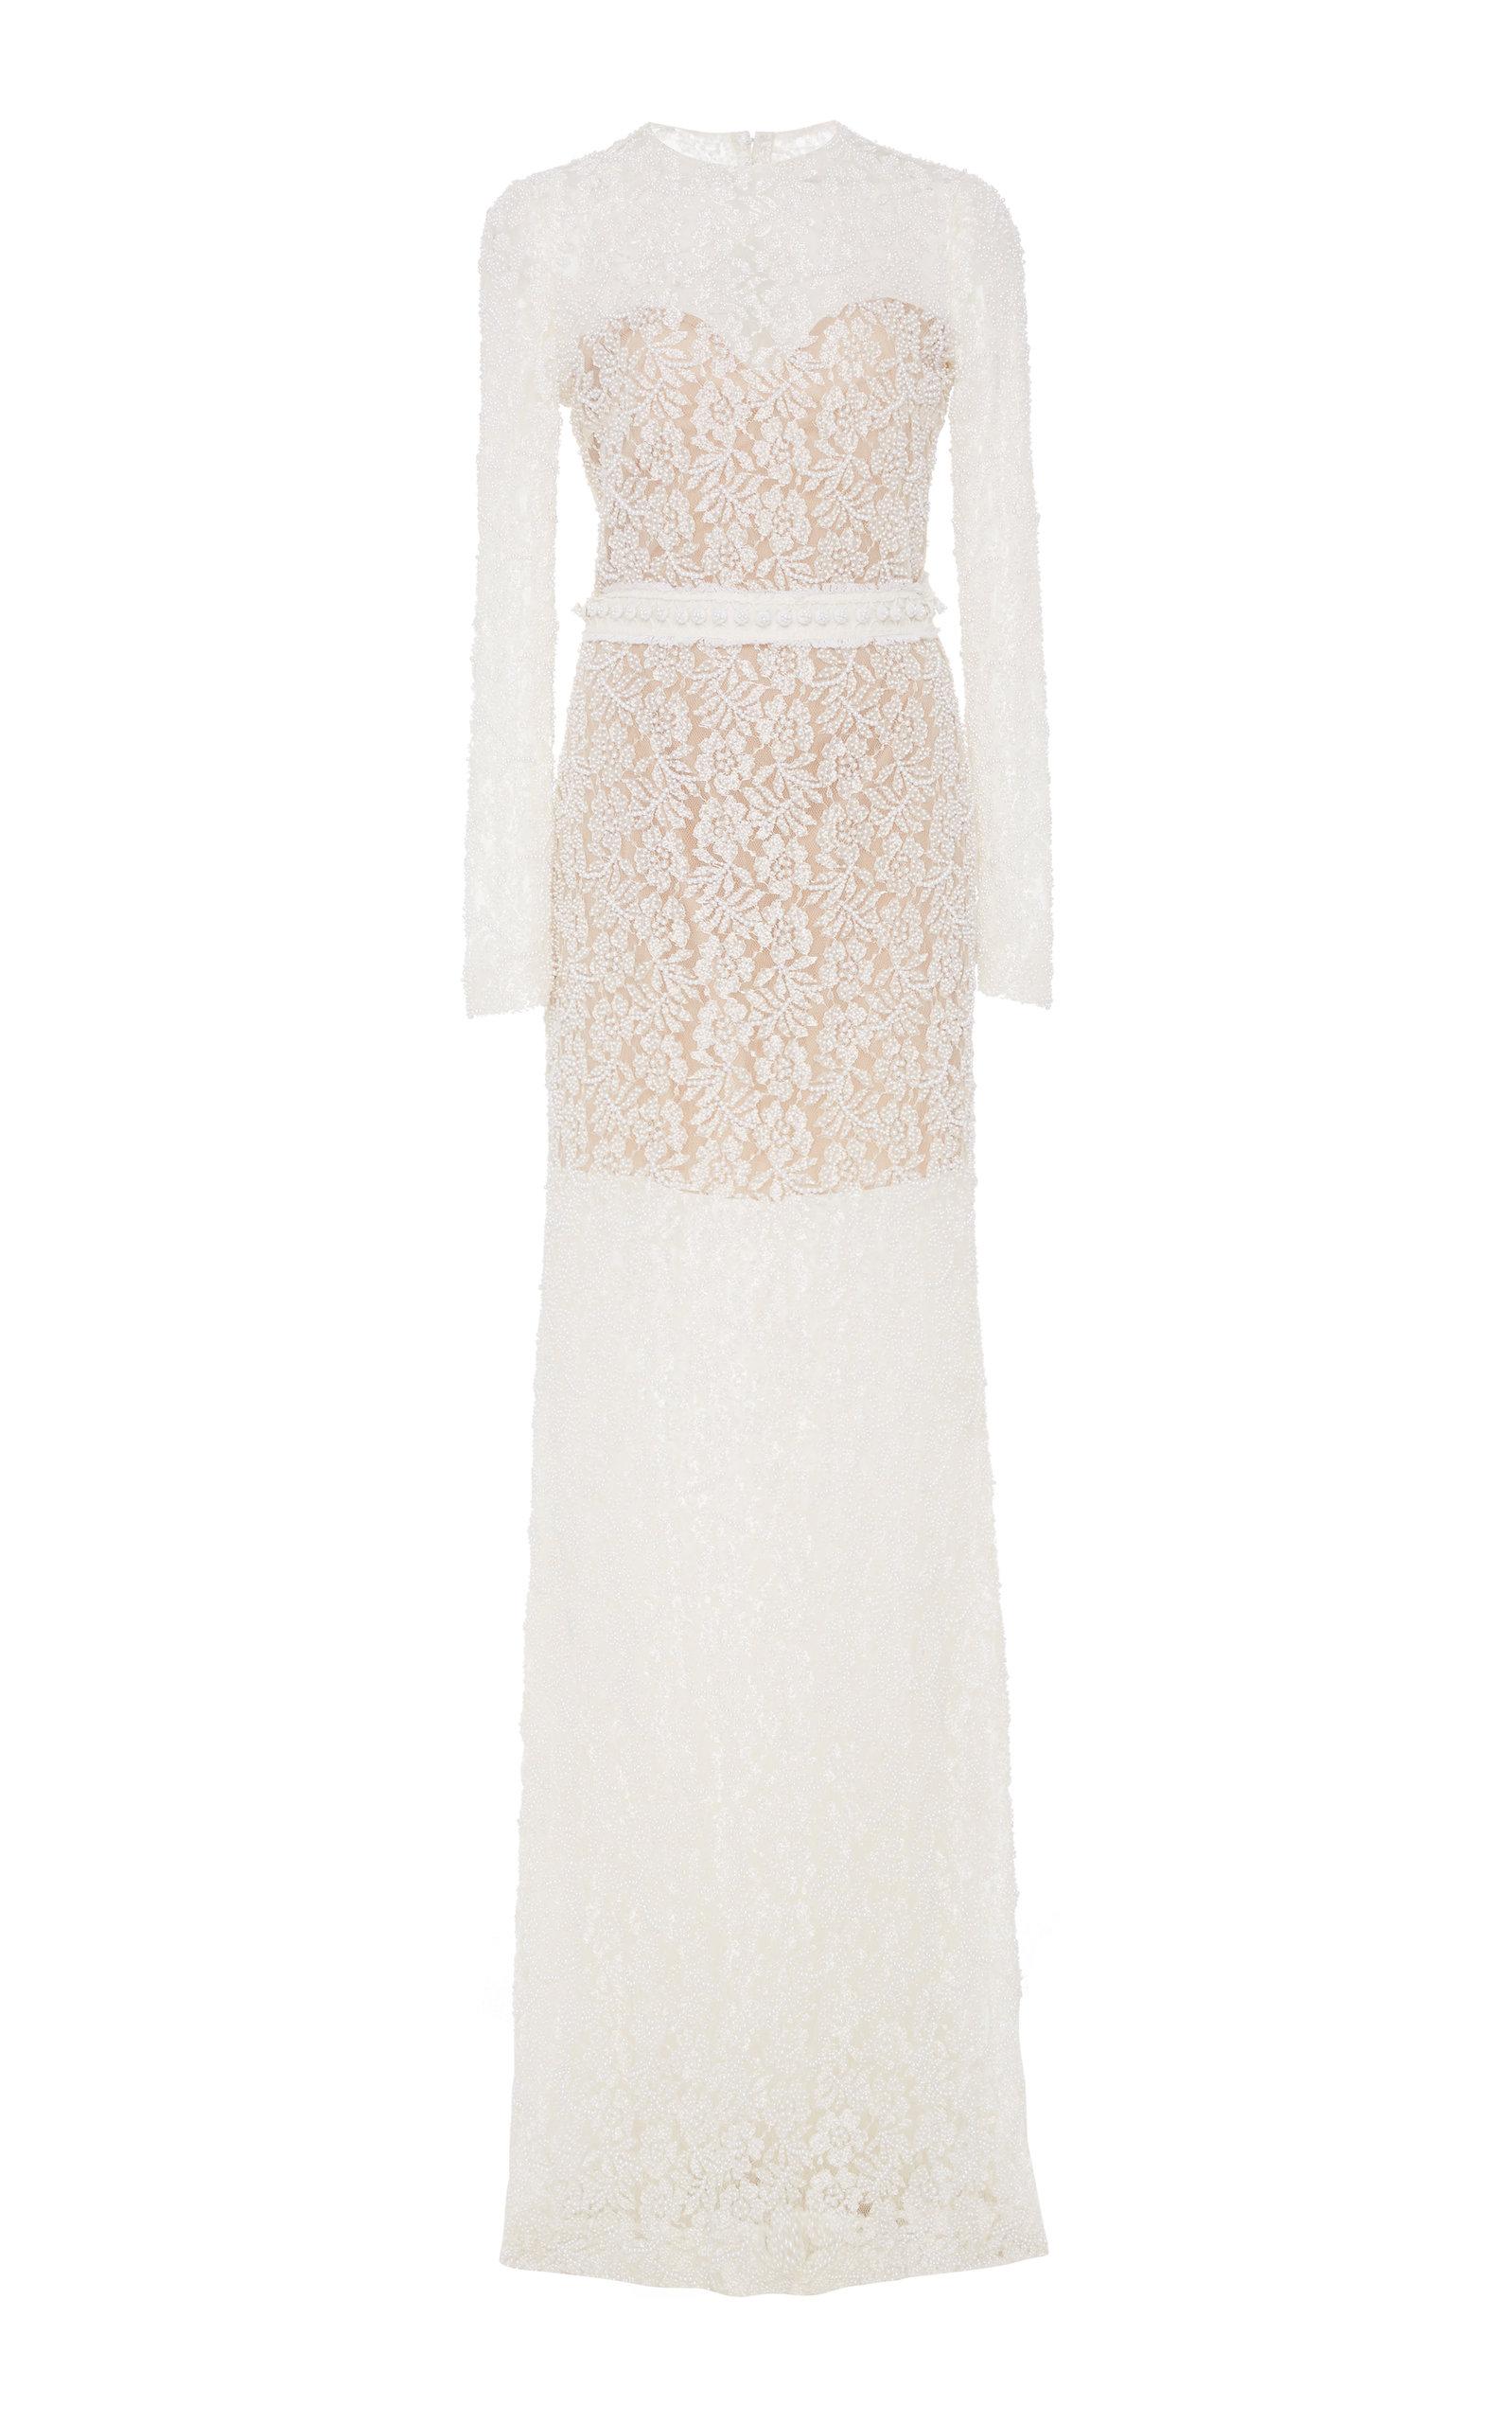 Buy Costarellos Bridal Beaded Lace Maxi Dress online, shop Costarellos Bridal at the best price